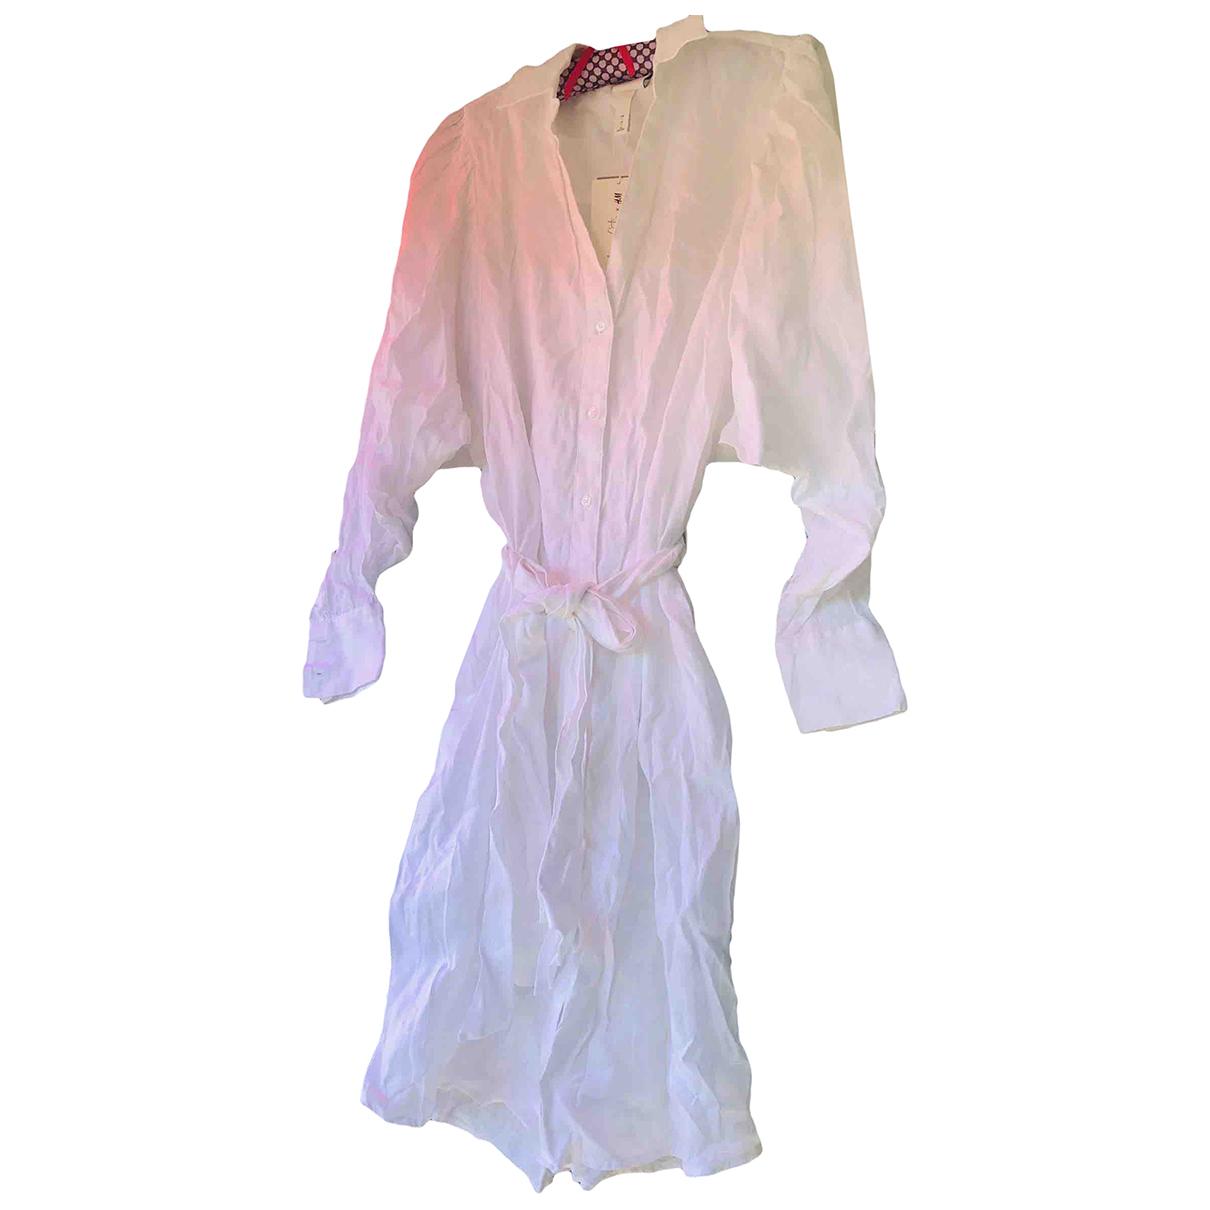 Johanna Ortiz X H&m \N White Linen dress for Women L International